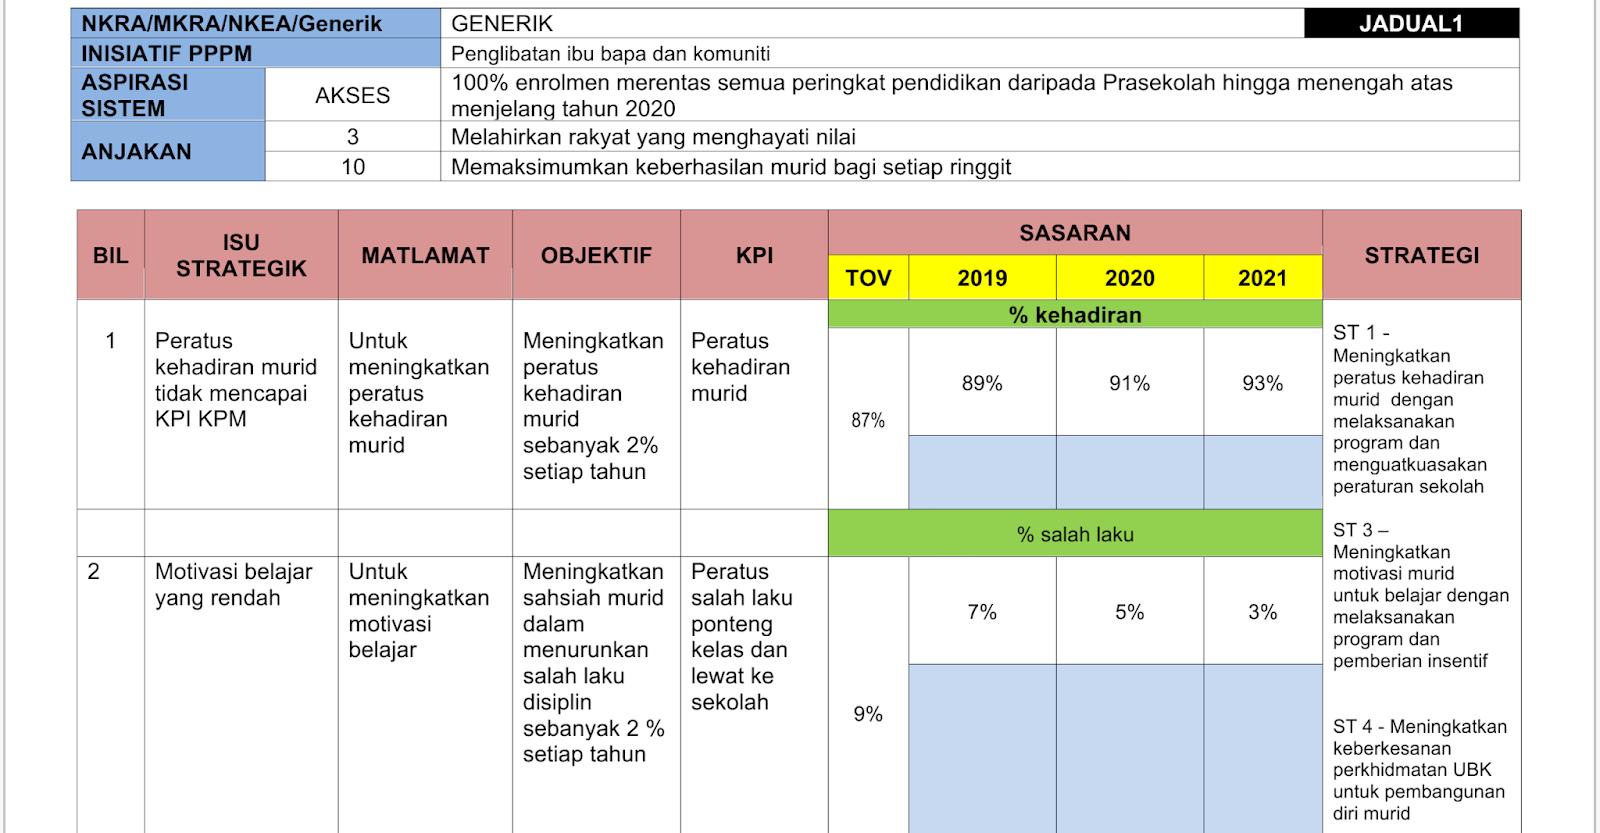 Kaunselor Nurhaiza Che Mat Perancangan Strategik Unit Bimbingan Kaunseling 2019 2021